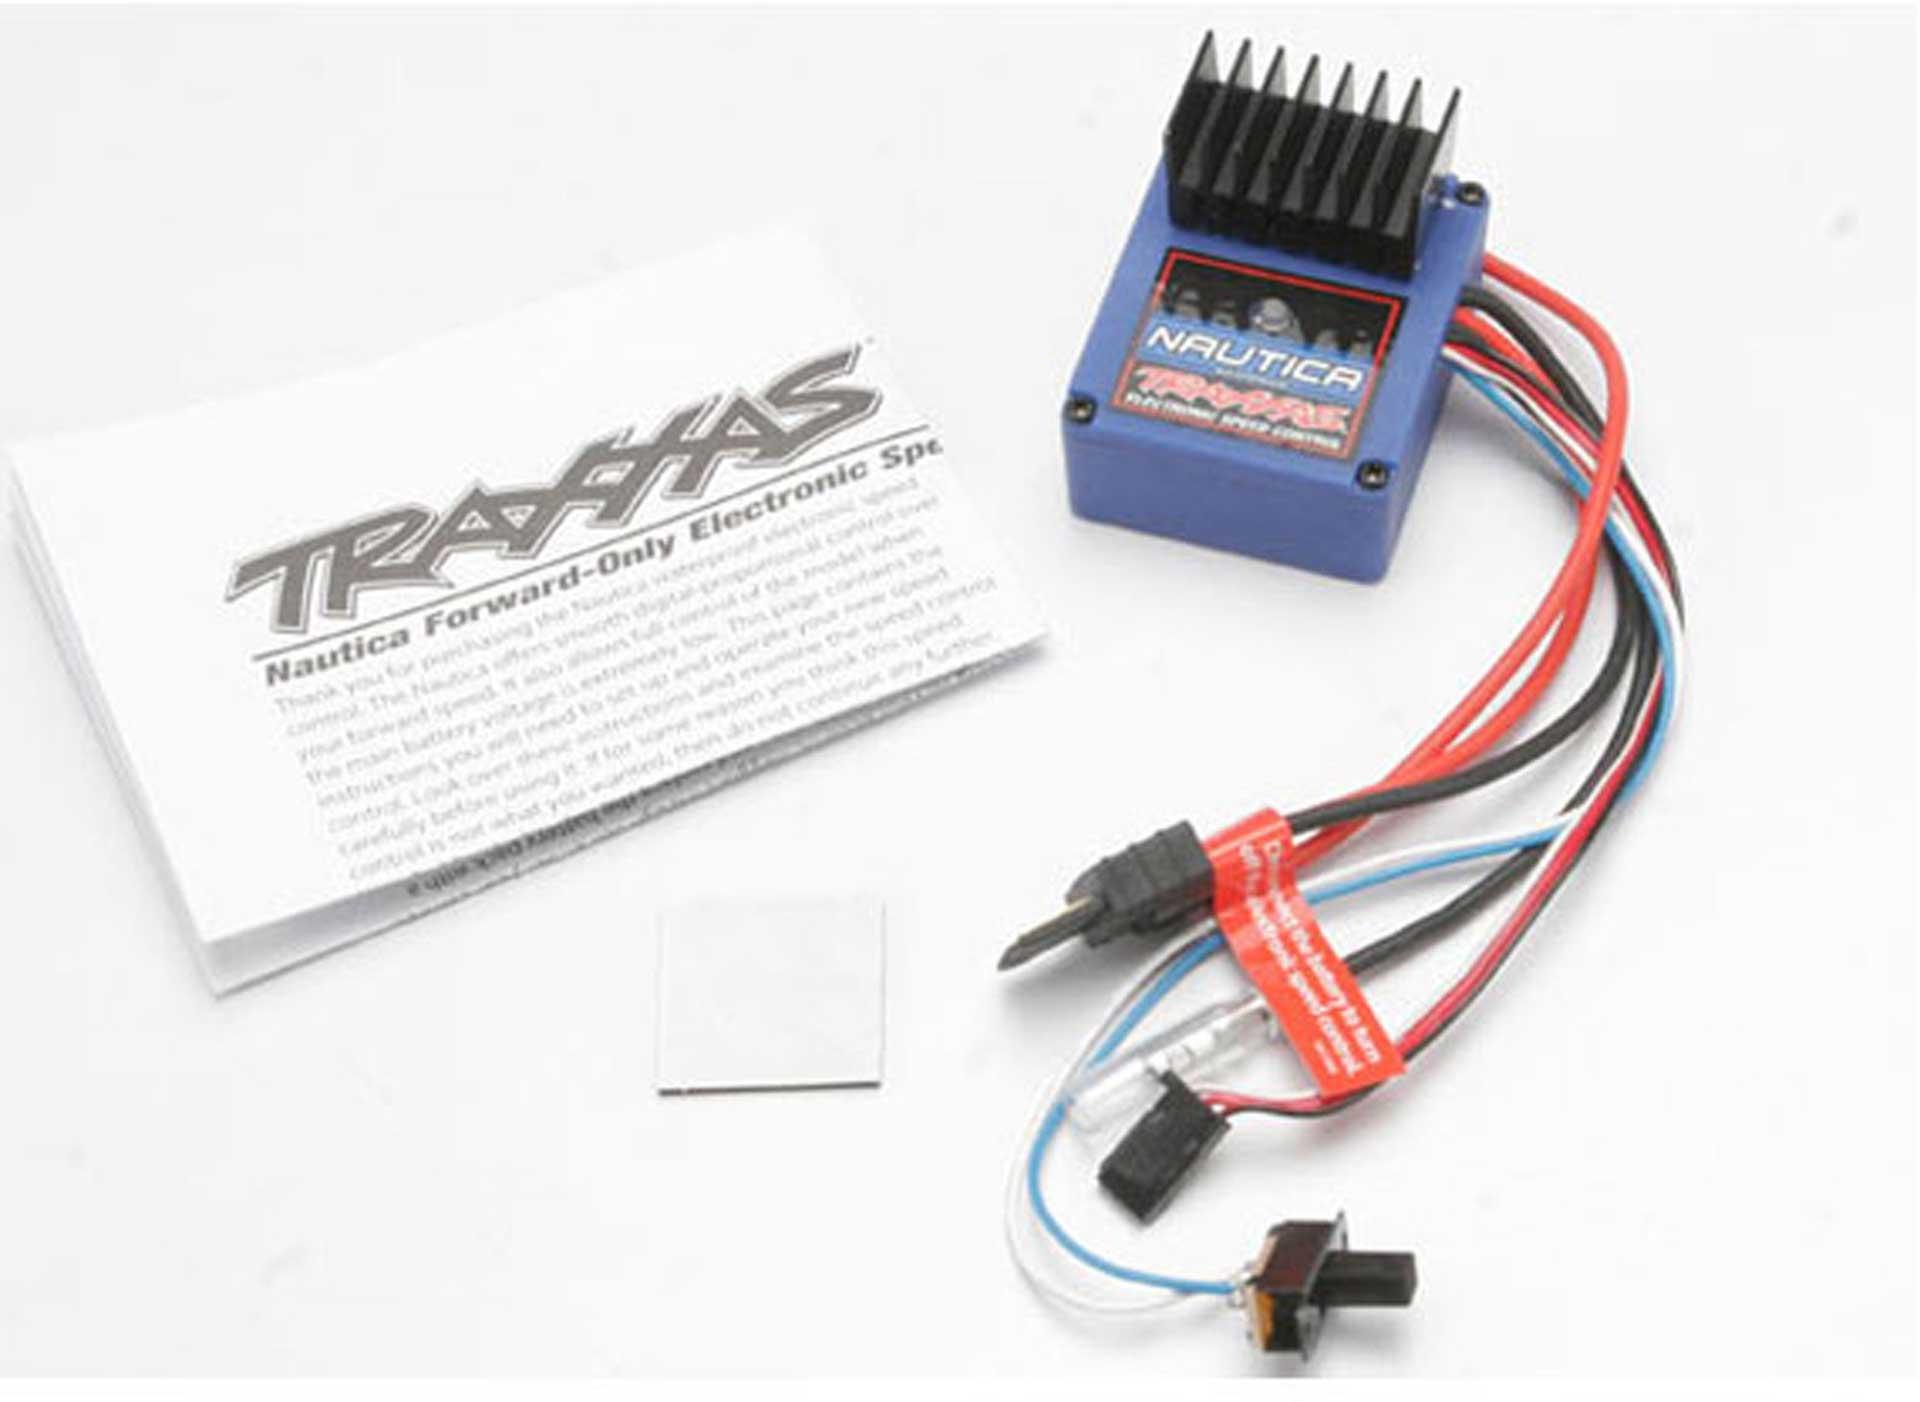 TRAXXAS NAUTICA ELECTRONIC SPEED CONTR